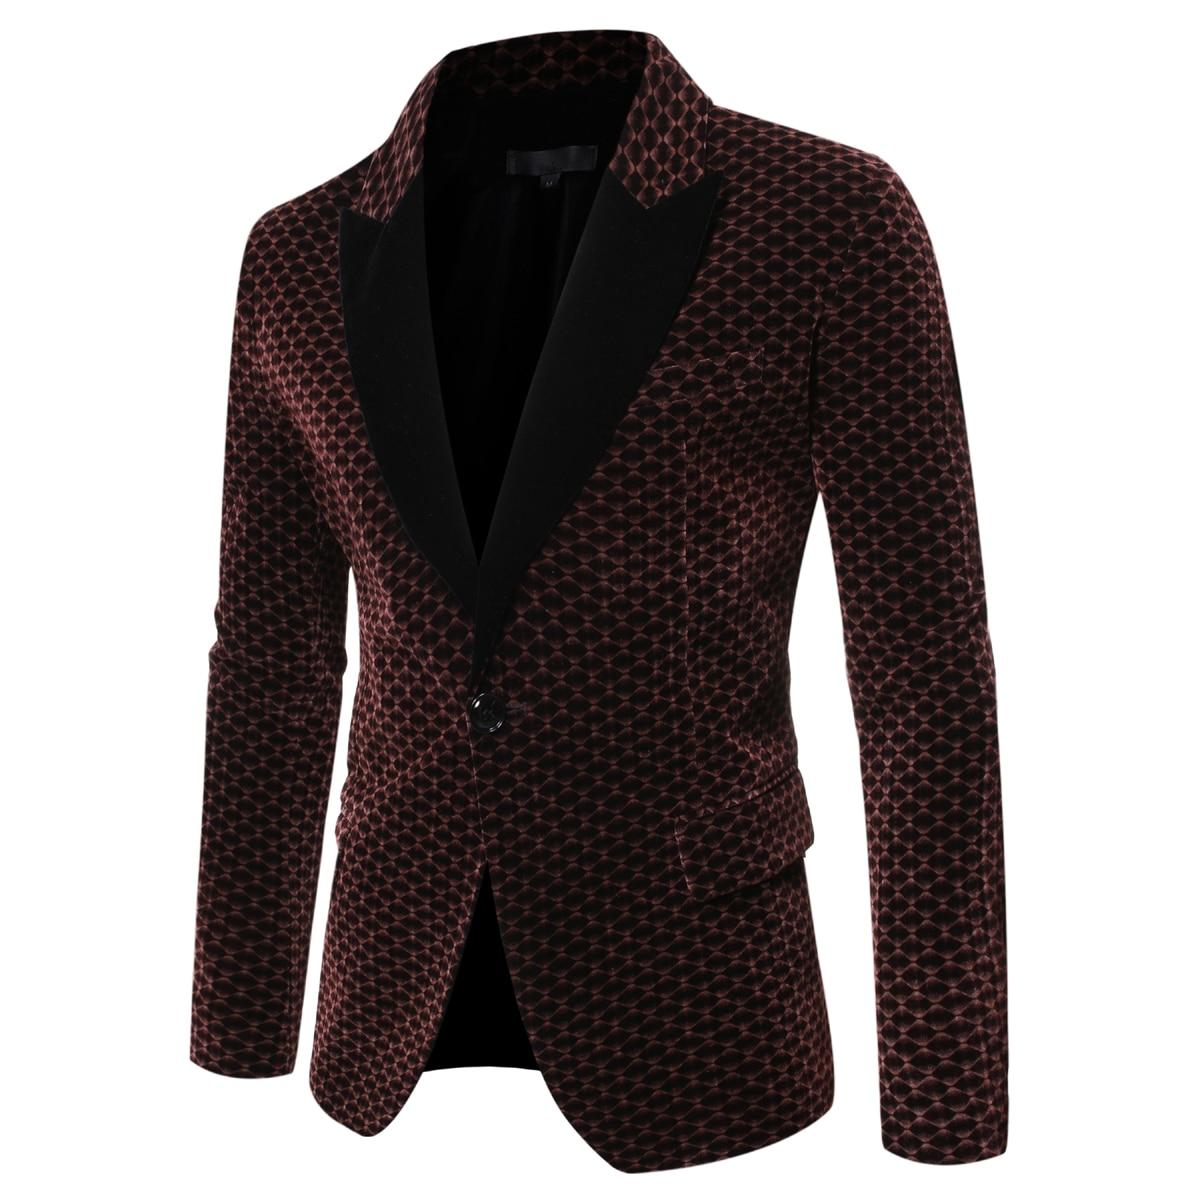 2019 Autumn Winter Blazer Vintage Luxury Velvet Men Suit Jacket For Wedding Party Formal Slim Fit Men's Business Dress Blazers